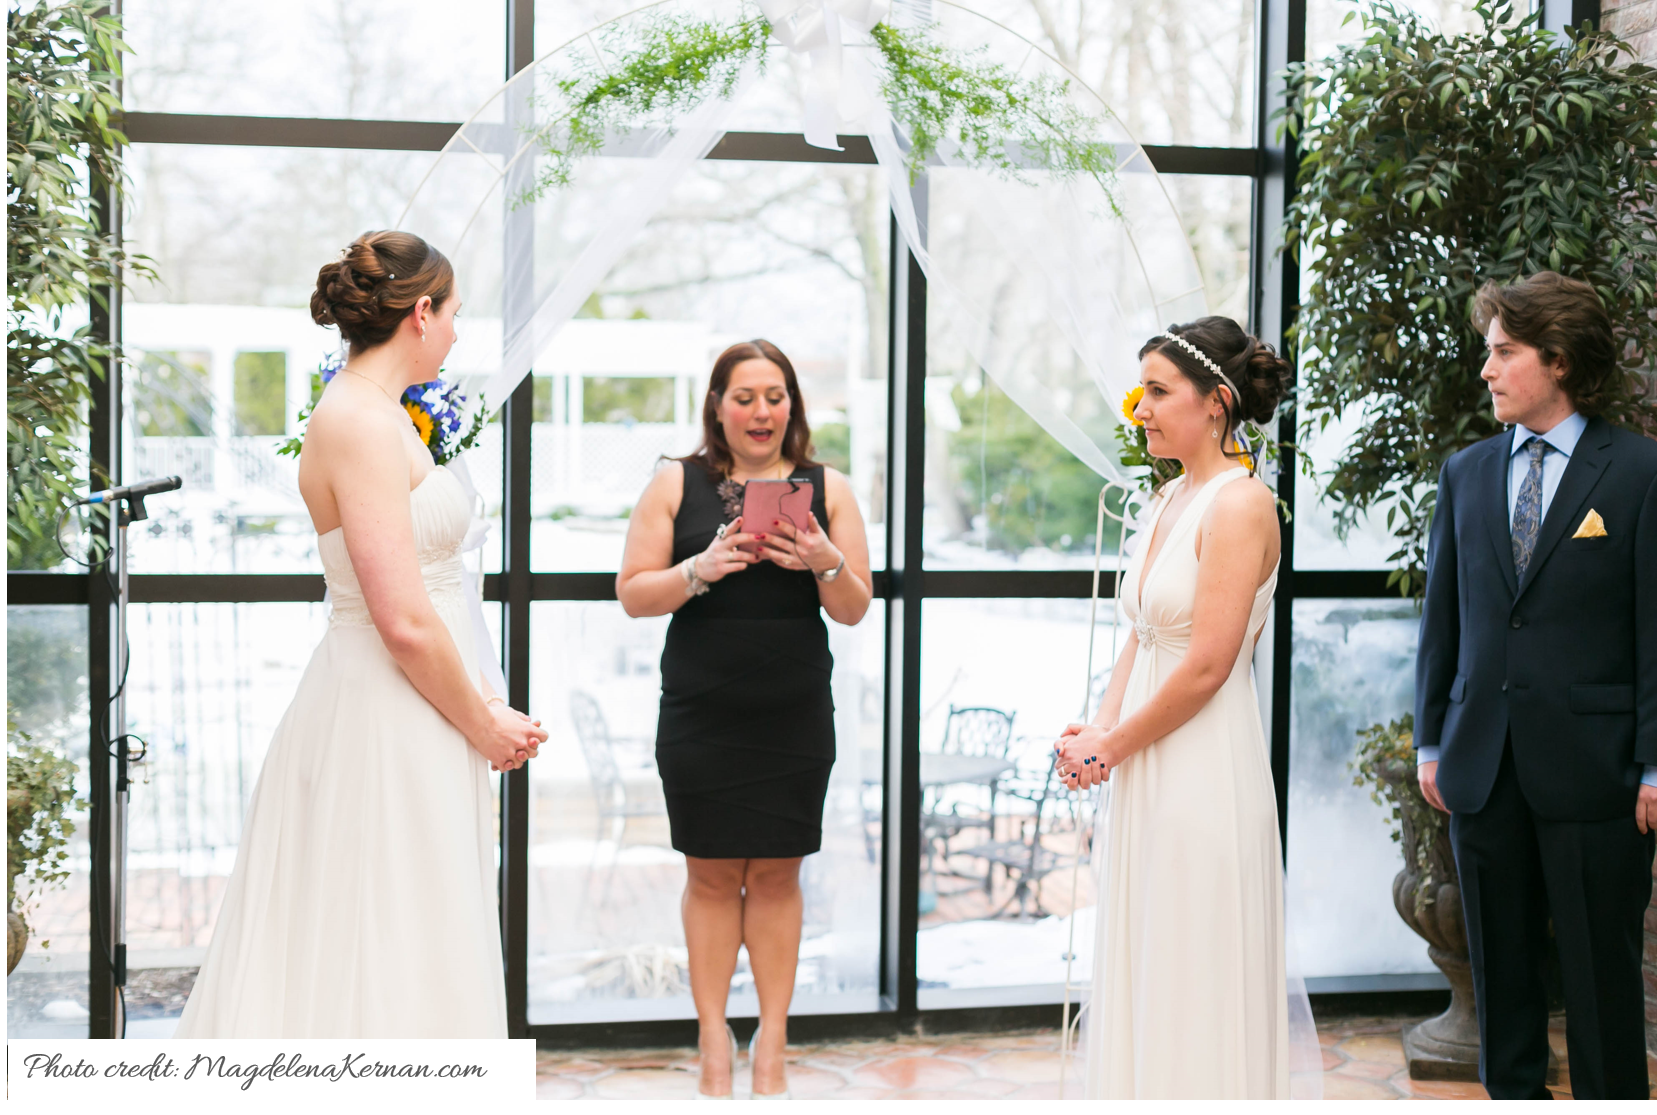 Chelsea _ Tina wedding 1.png